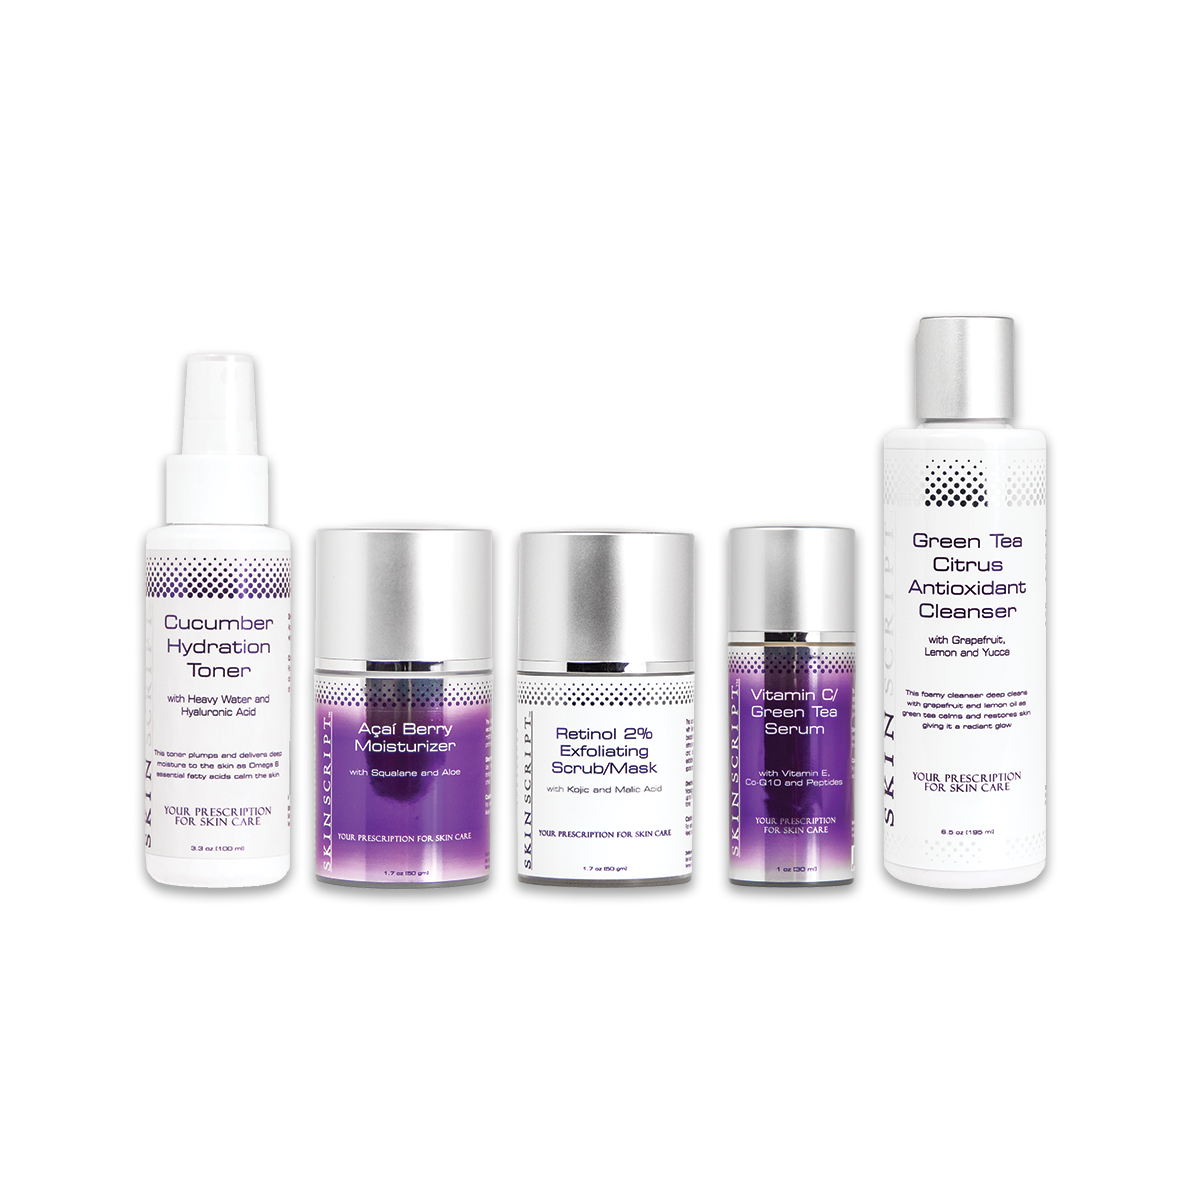 Rosacea/Sensitive Skin Kit Skin script, Sensitive skin